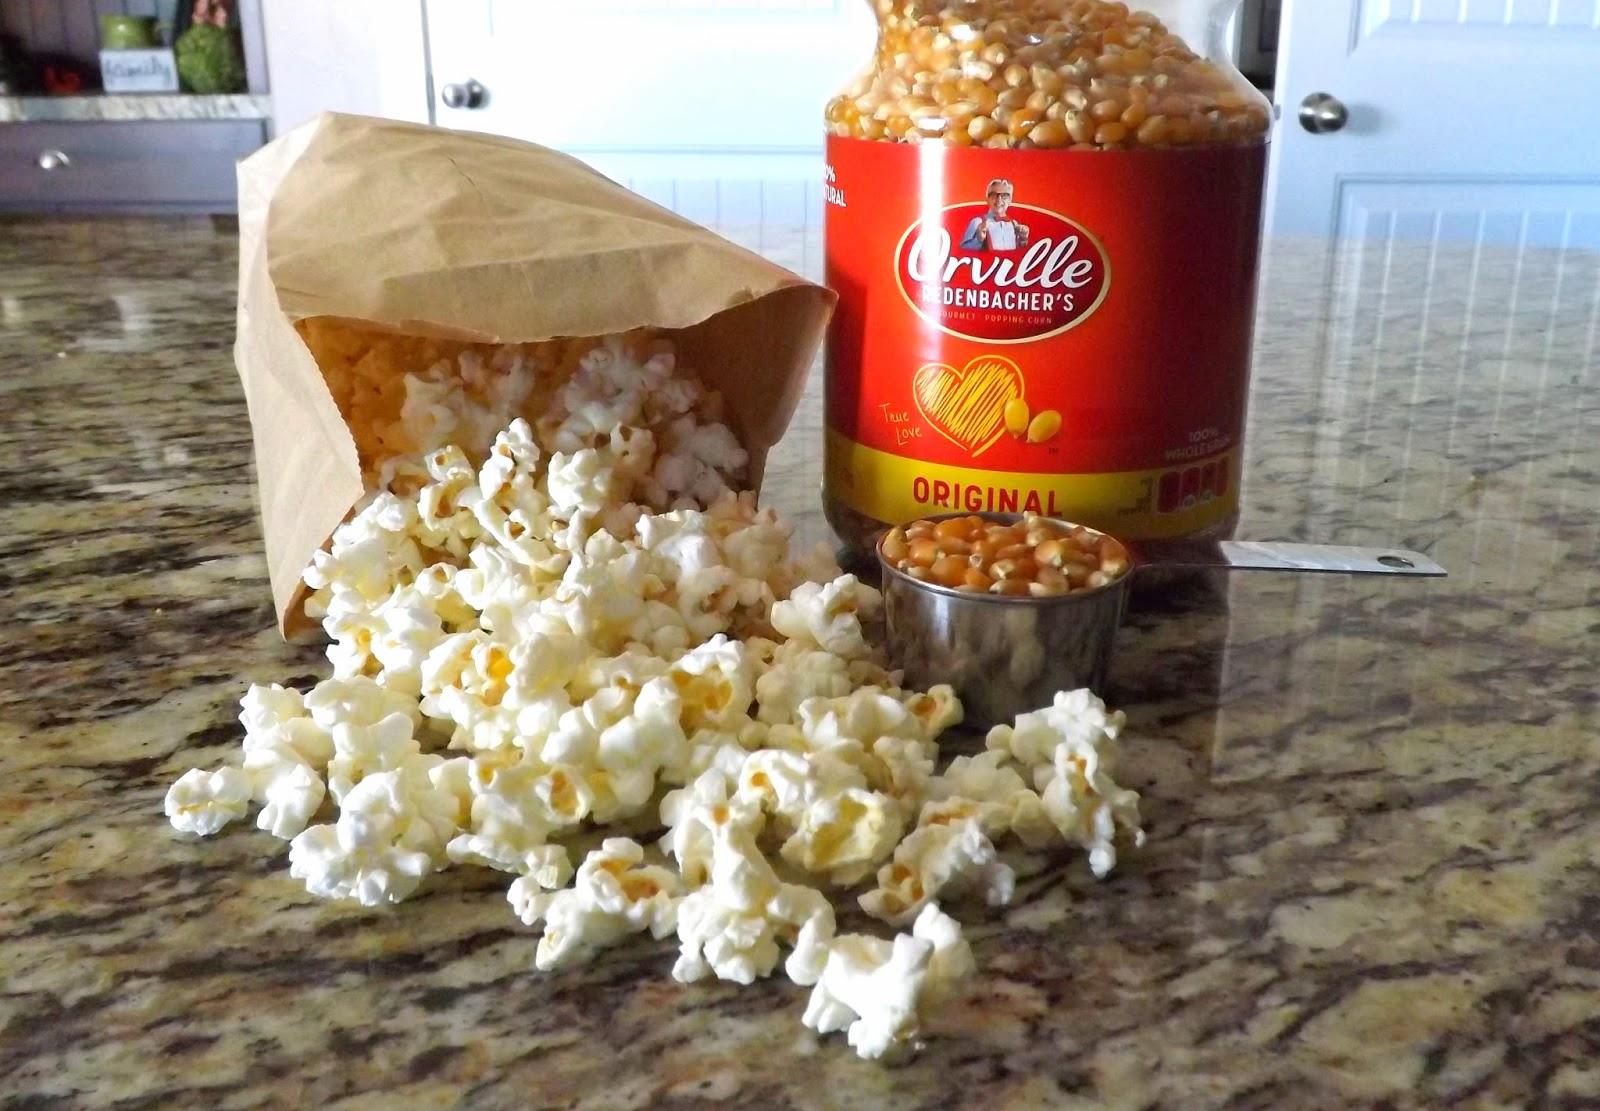 The Bake Off Flunkie Brown Bag Microwave Popcorn